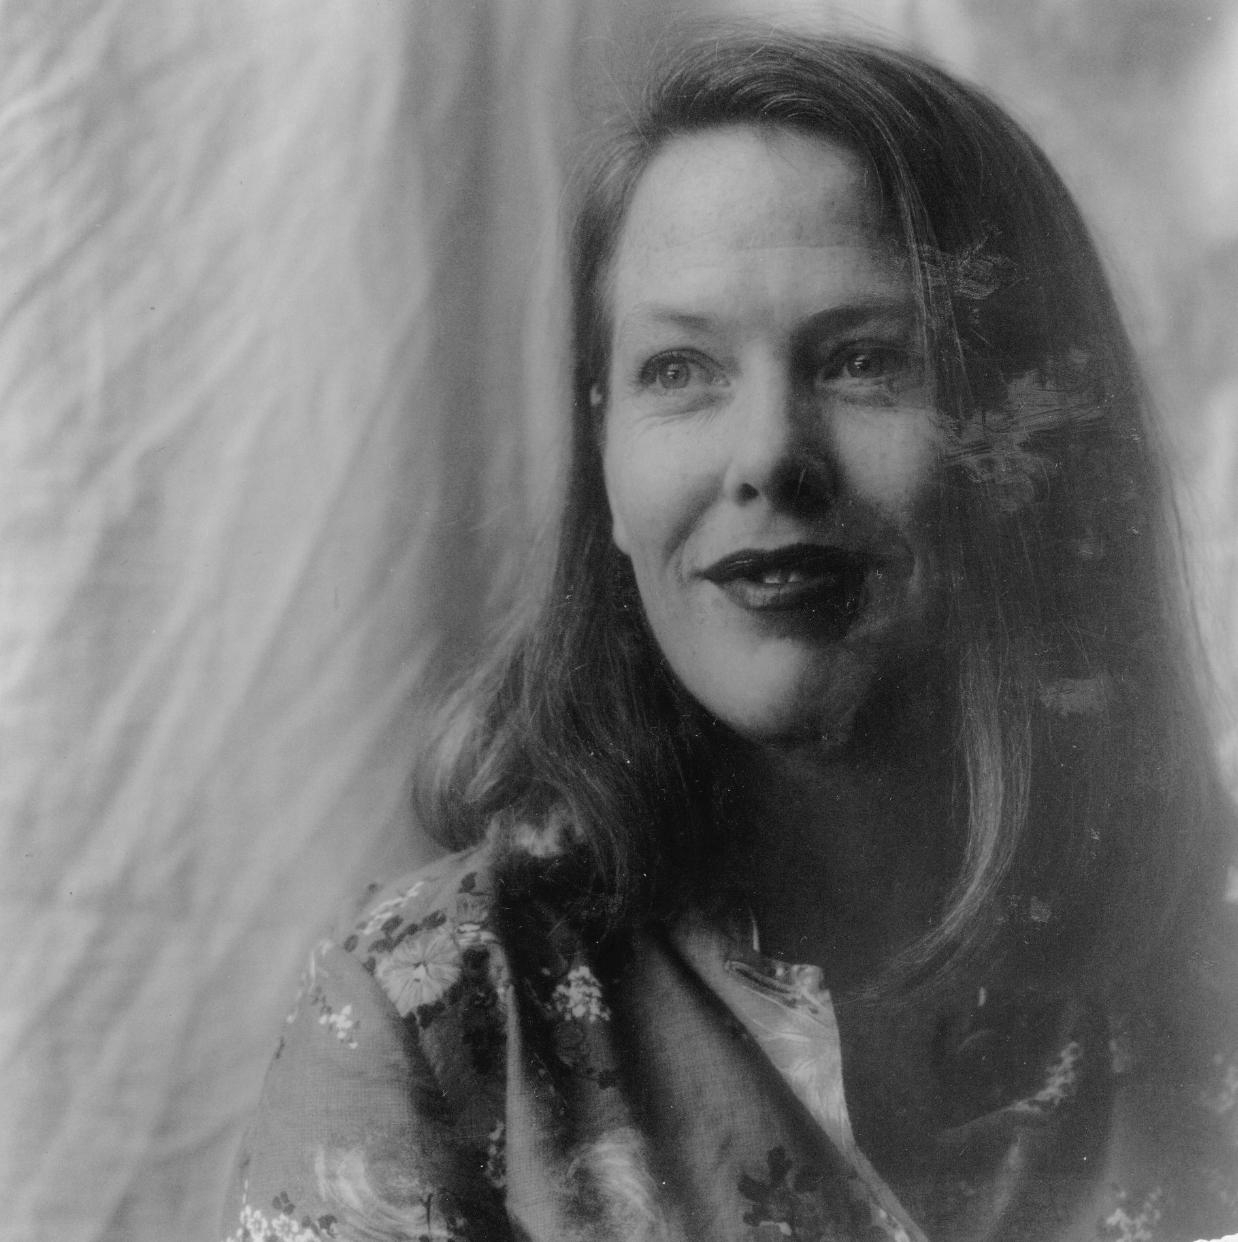 Ray portrait 1997_edited